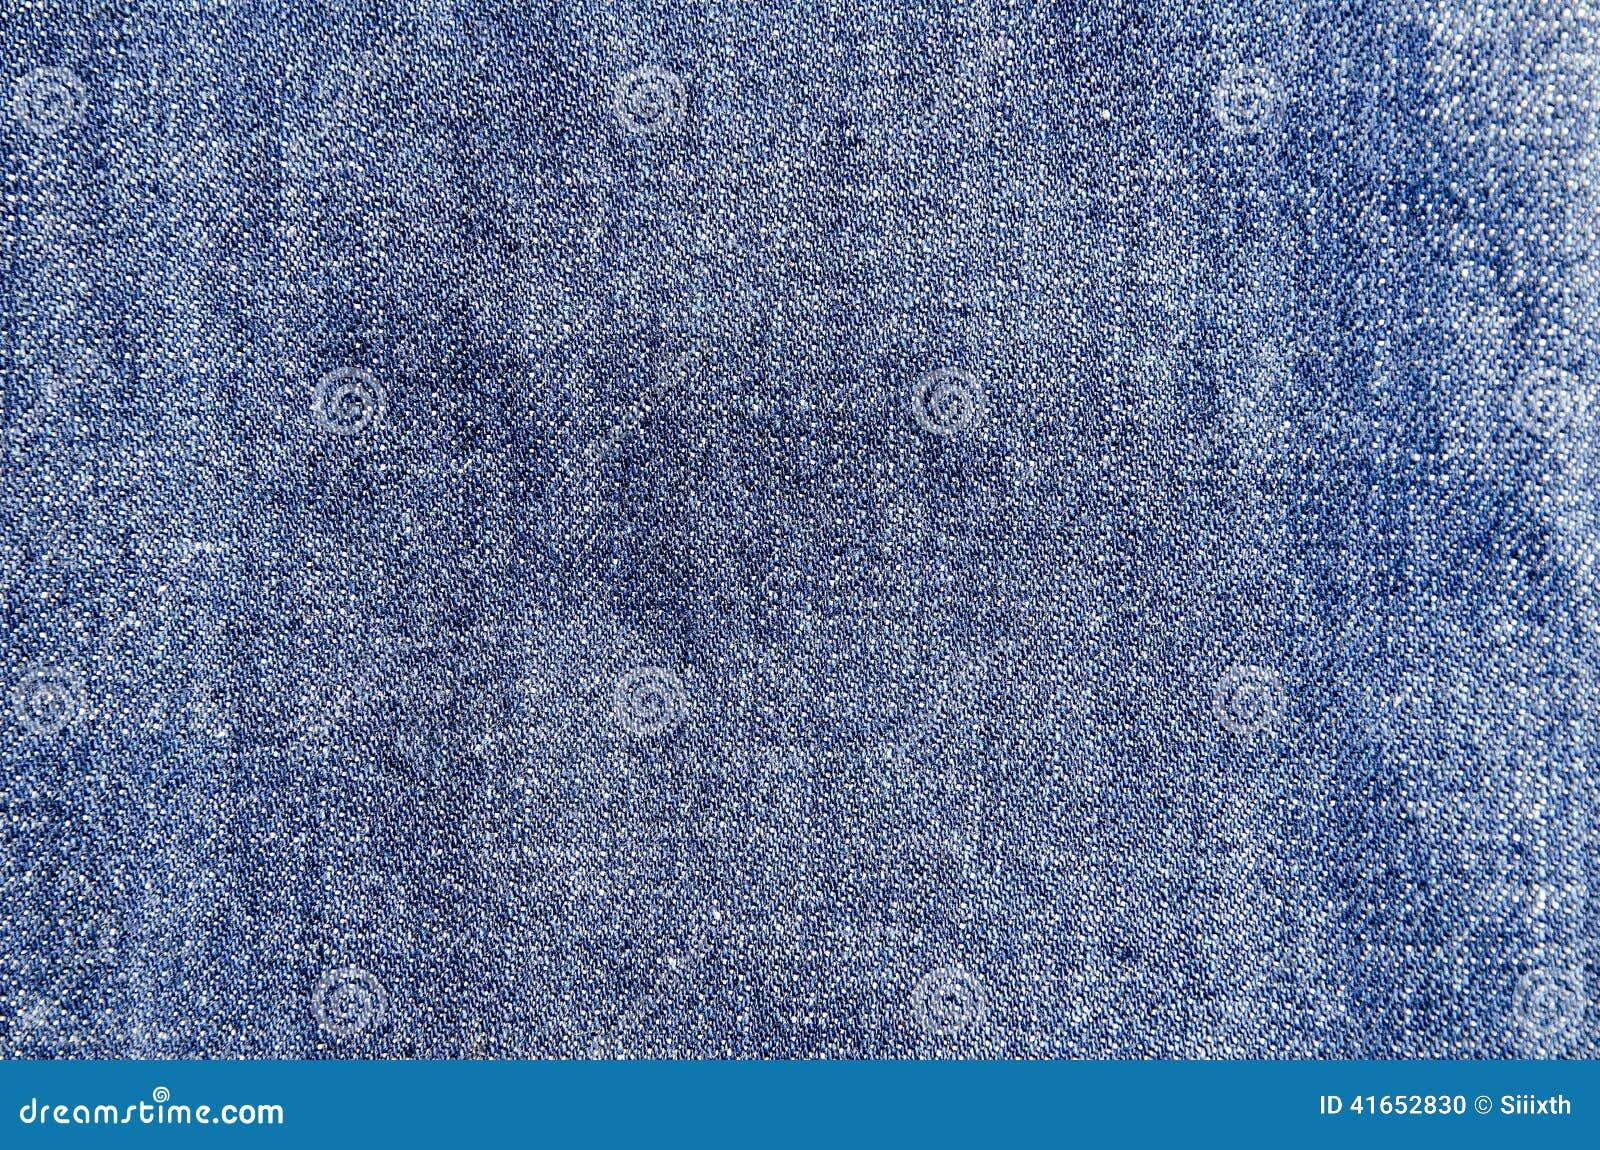 текстура голубого демикотона